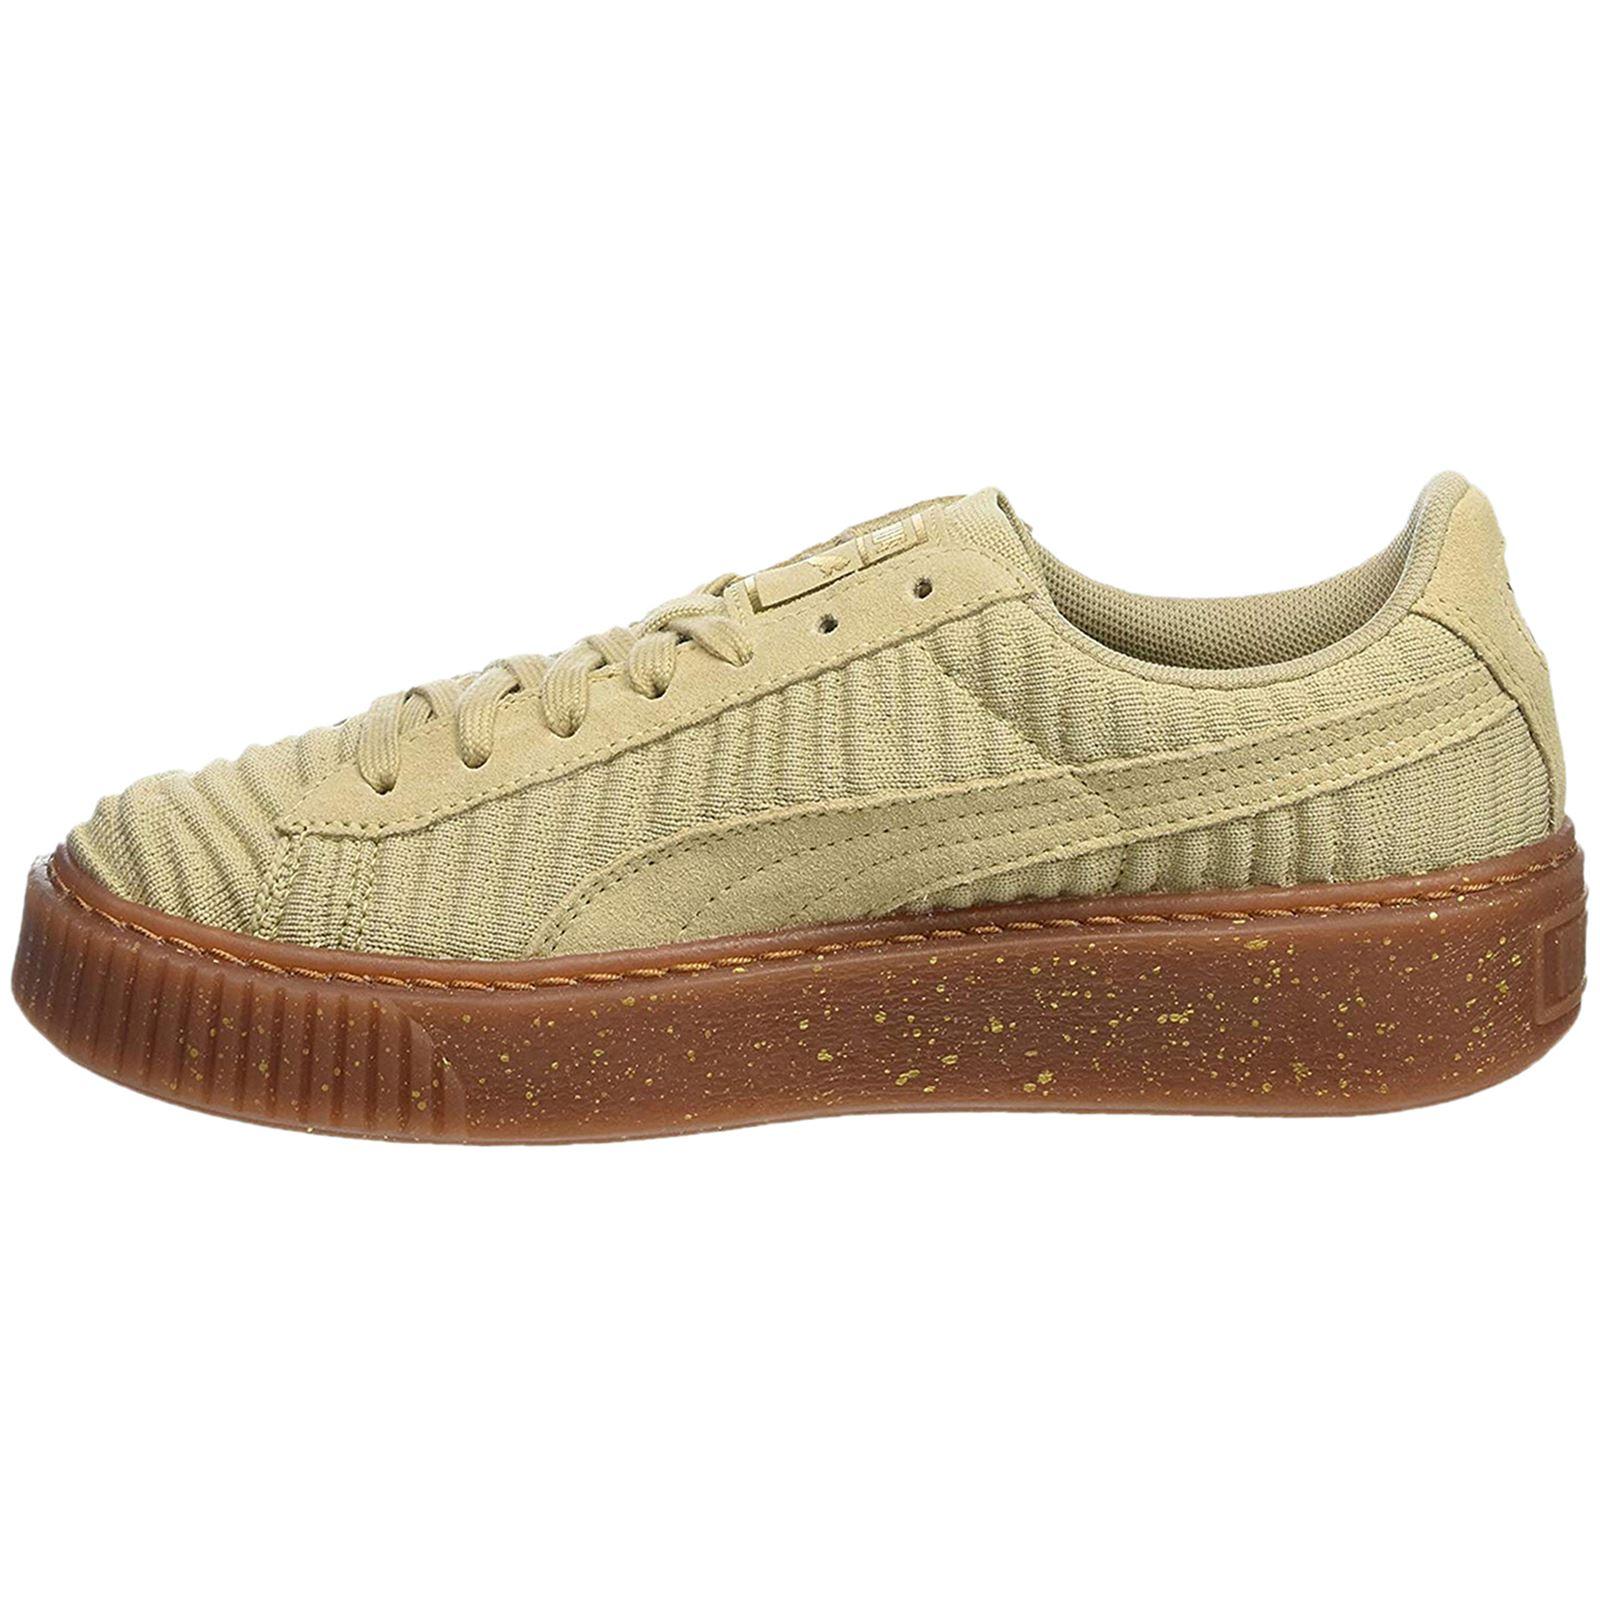 on sale d754a 5b183 ... Nike Mercurialx Victory VI IC IC IC Men s Soccer Shoe US 7-13 100% ...